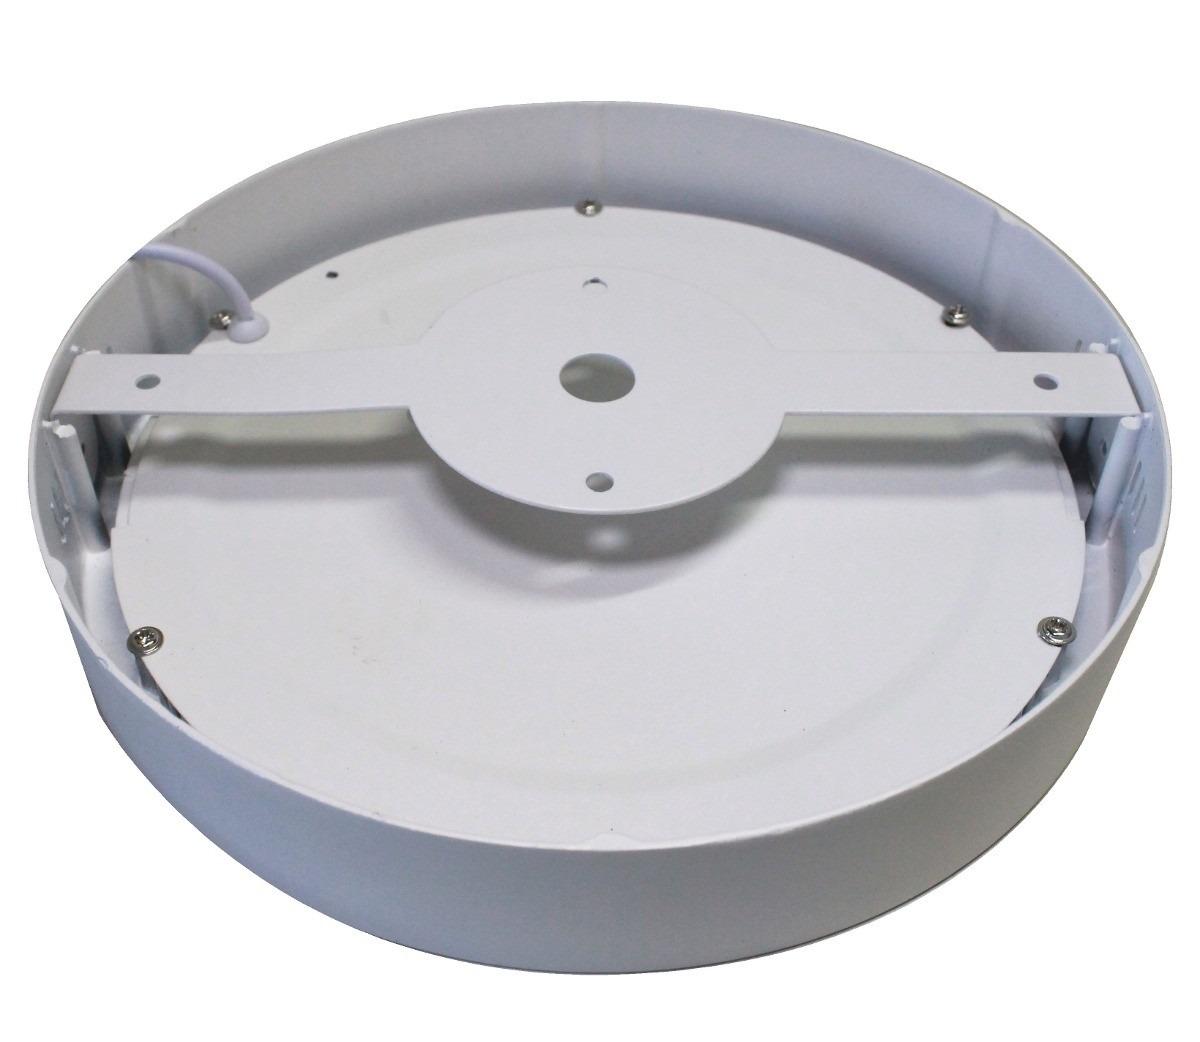 Kit 10 Painel Plafon Redondo Luminária Sobrepor Led 18w Bivolt Branco Quente - RPC-COMMERCE